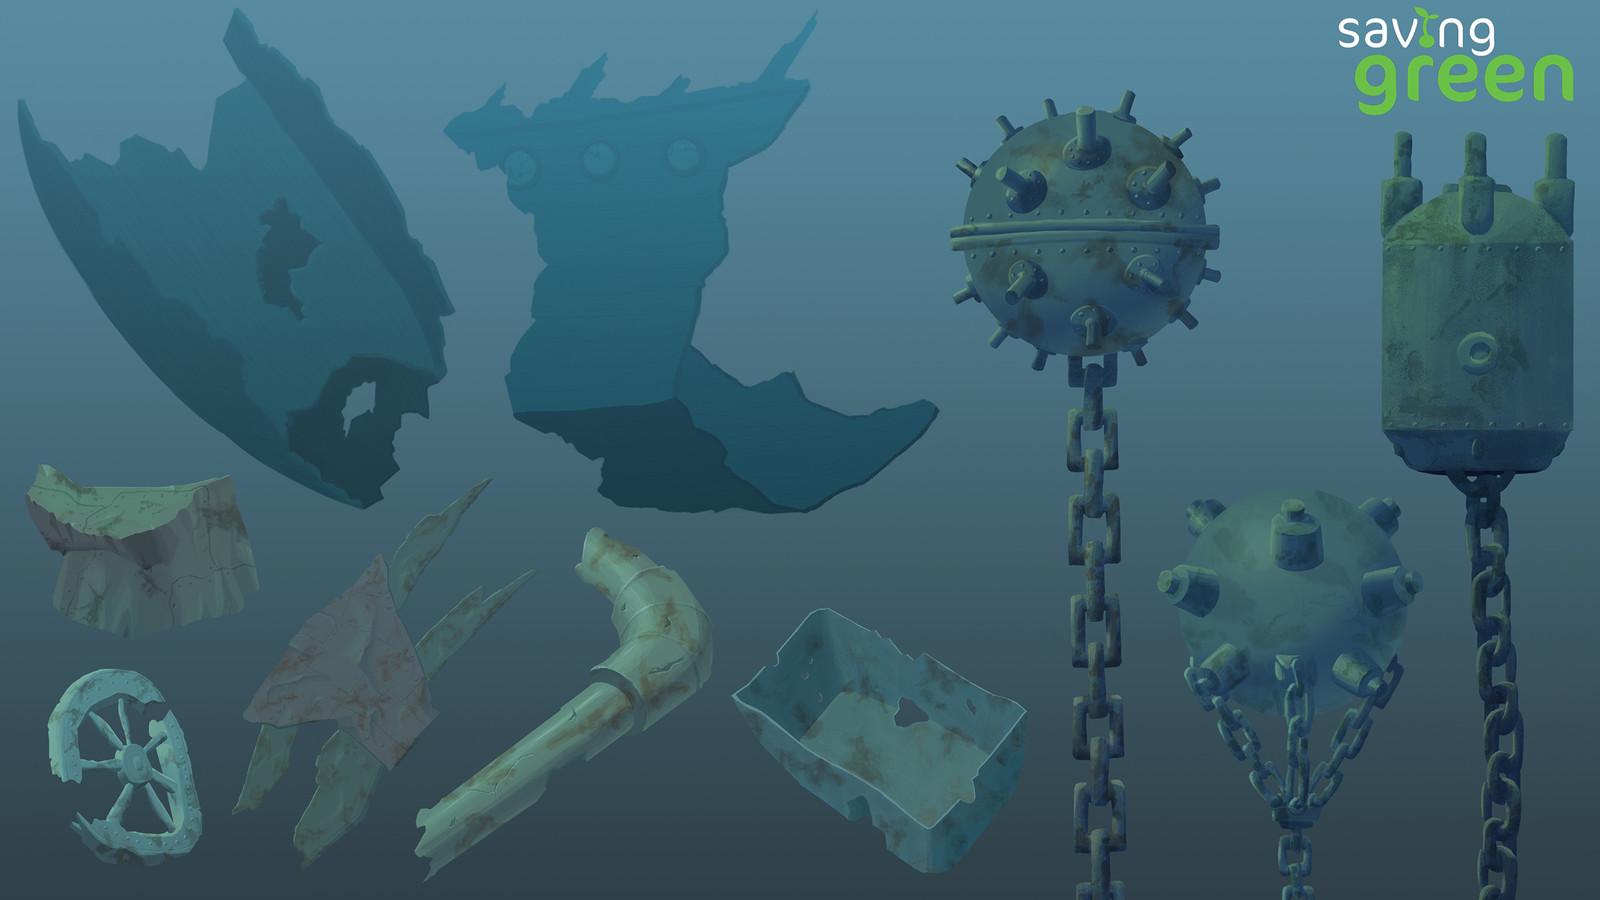 Saving Green - Underwater Props 1